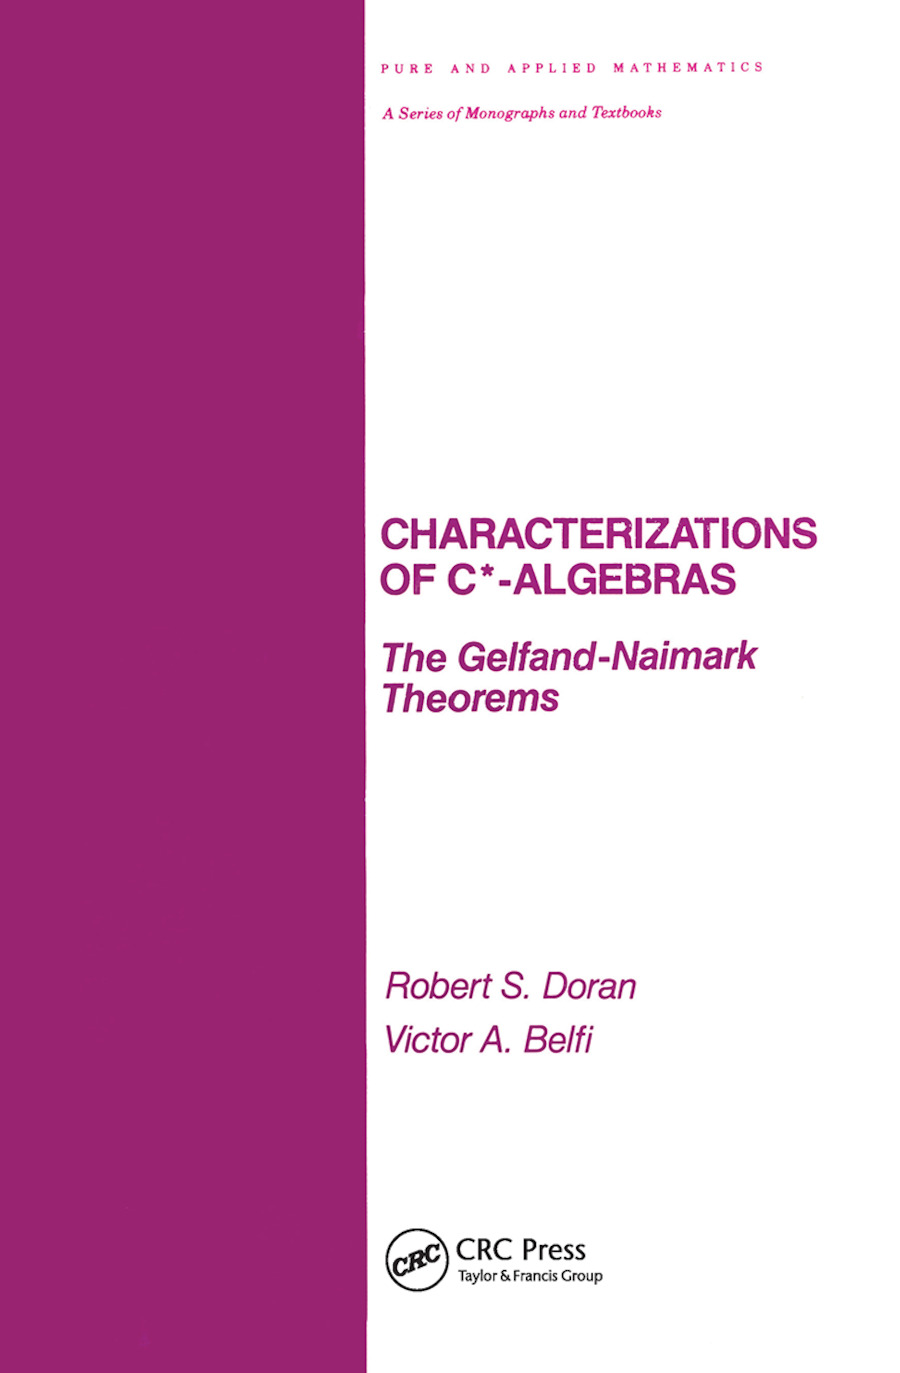 GEOMETRICAL CHARACTERIZATIONS OF C*-ALGEBRAS